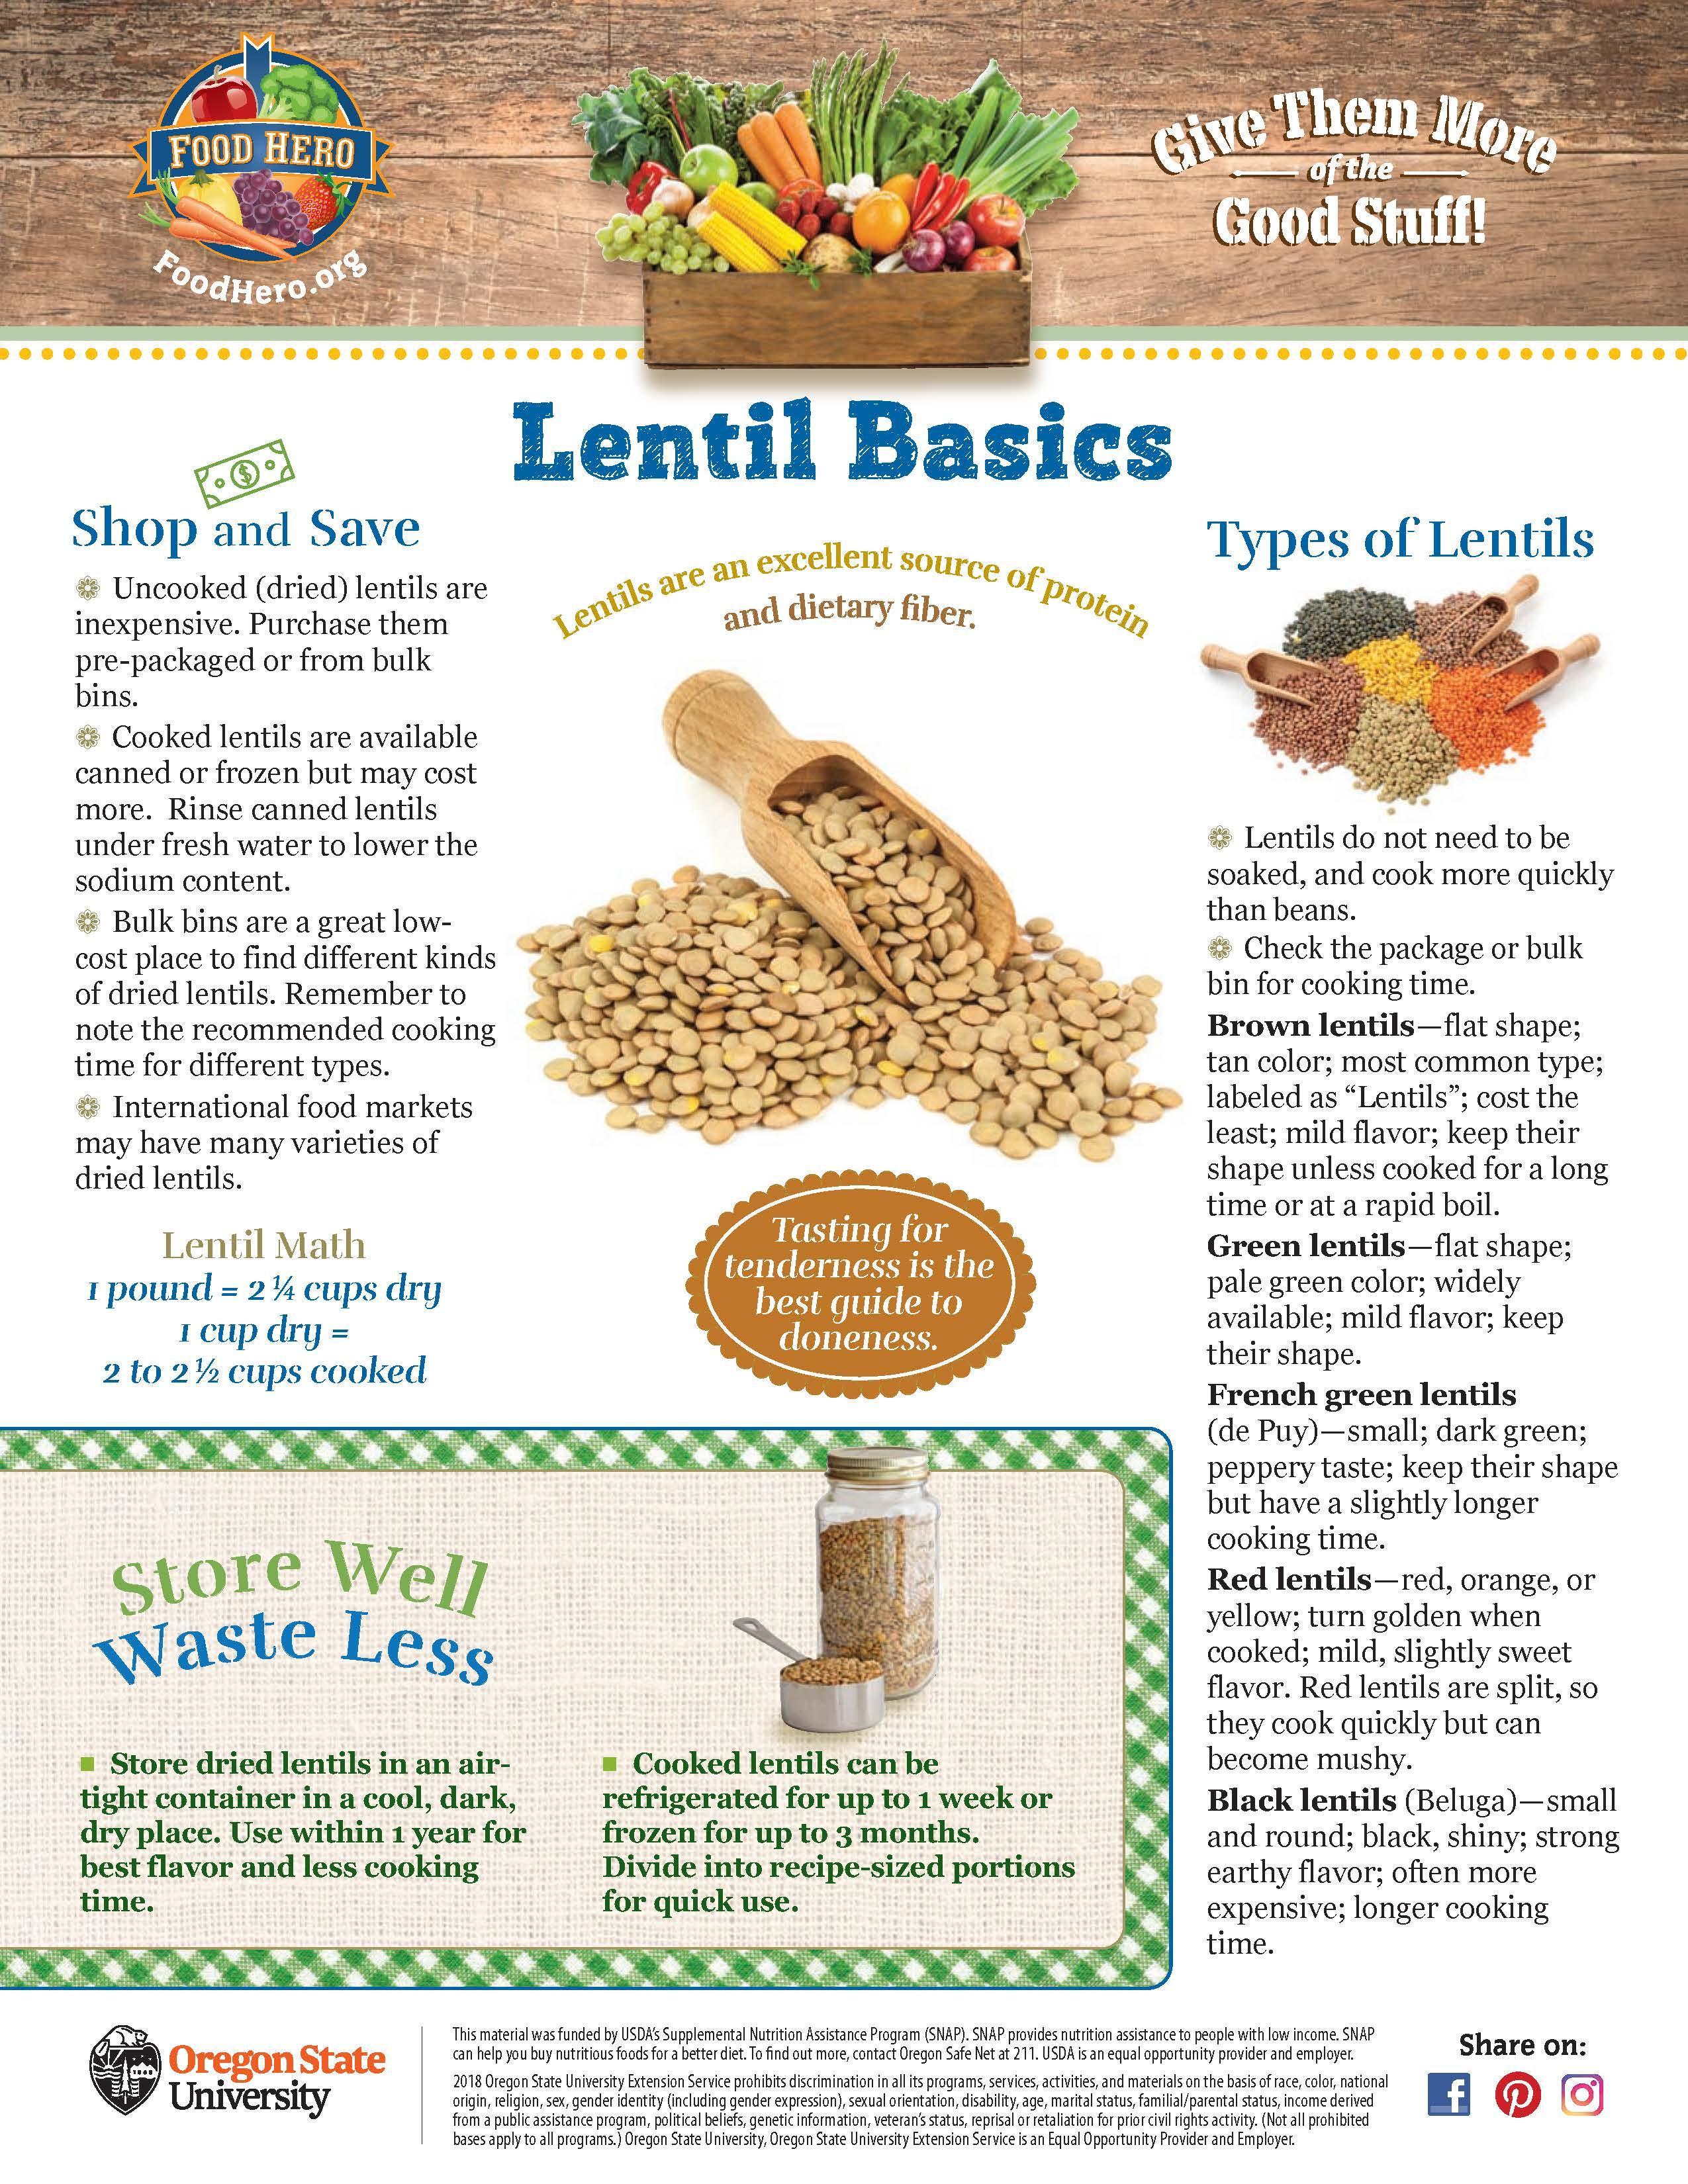 Lentil Food Hero Monthly